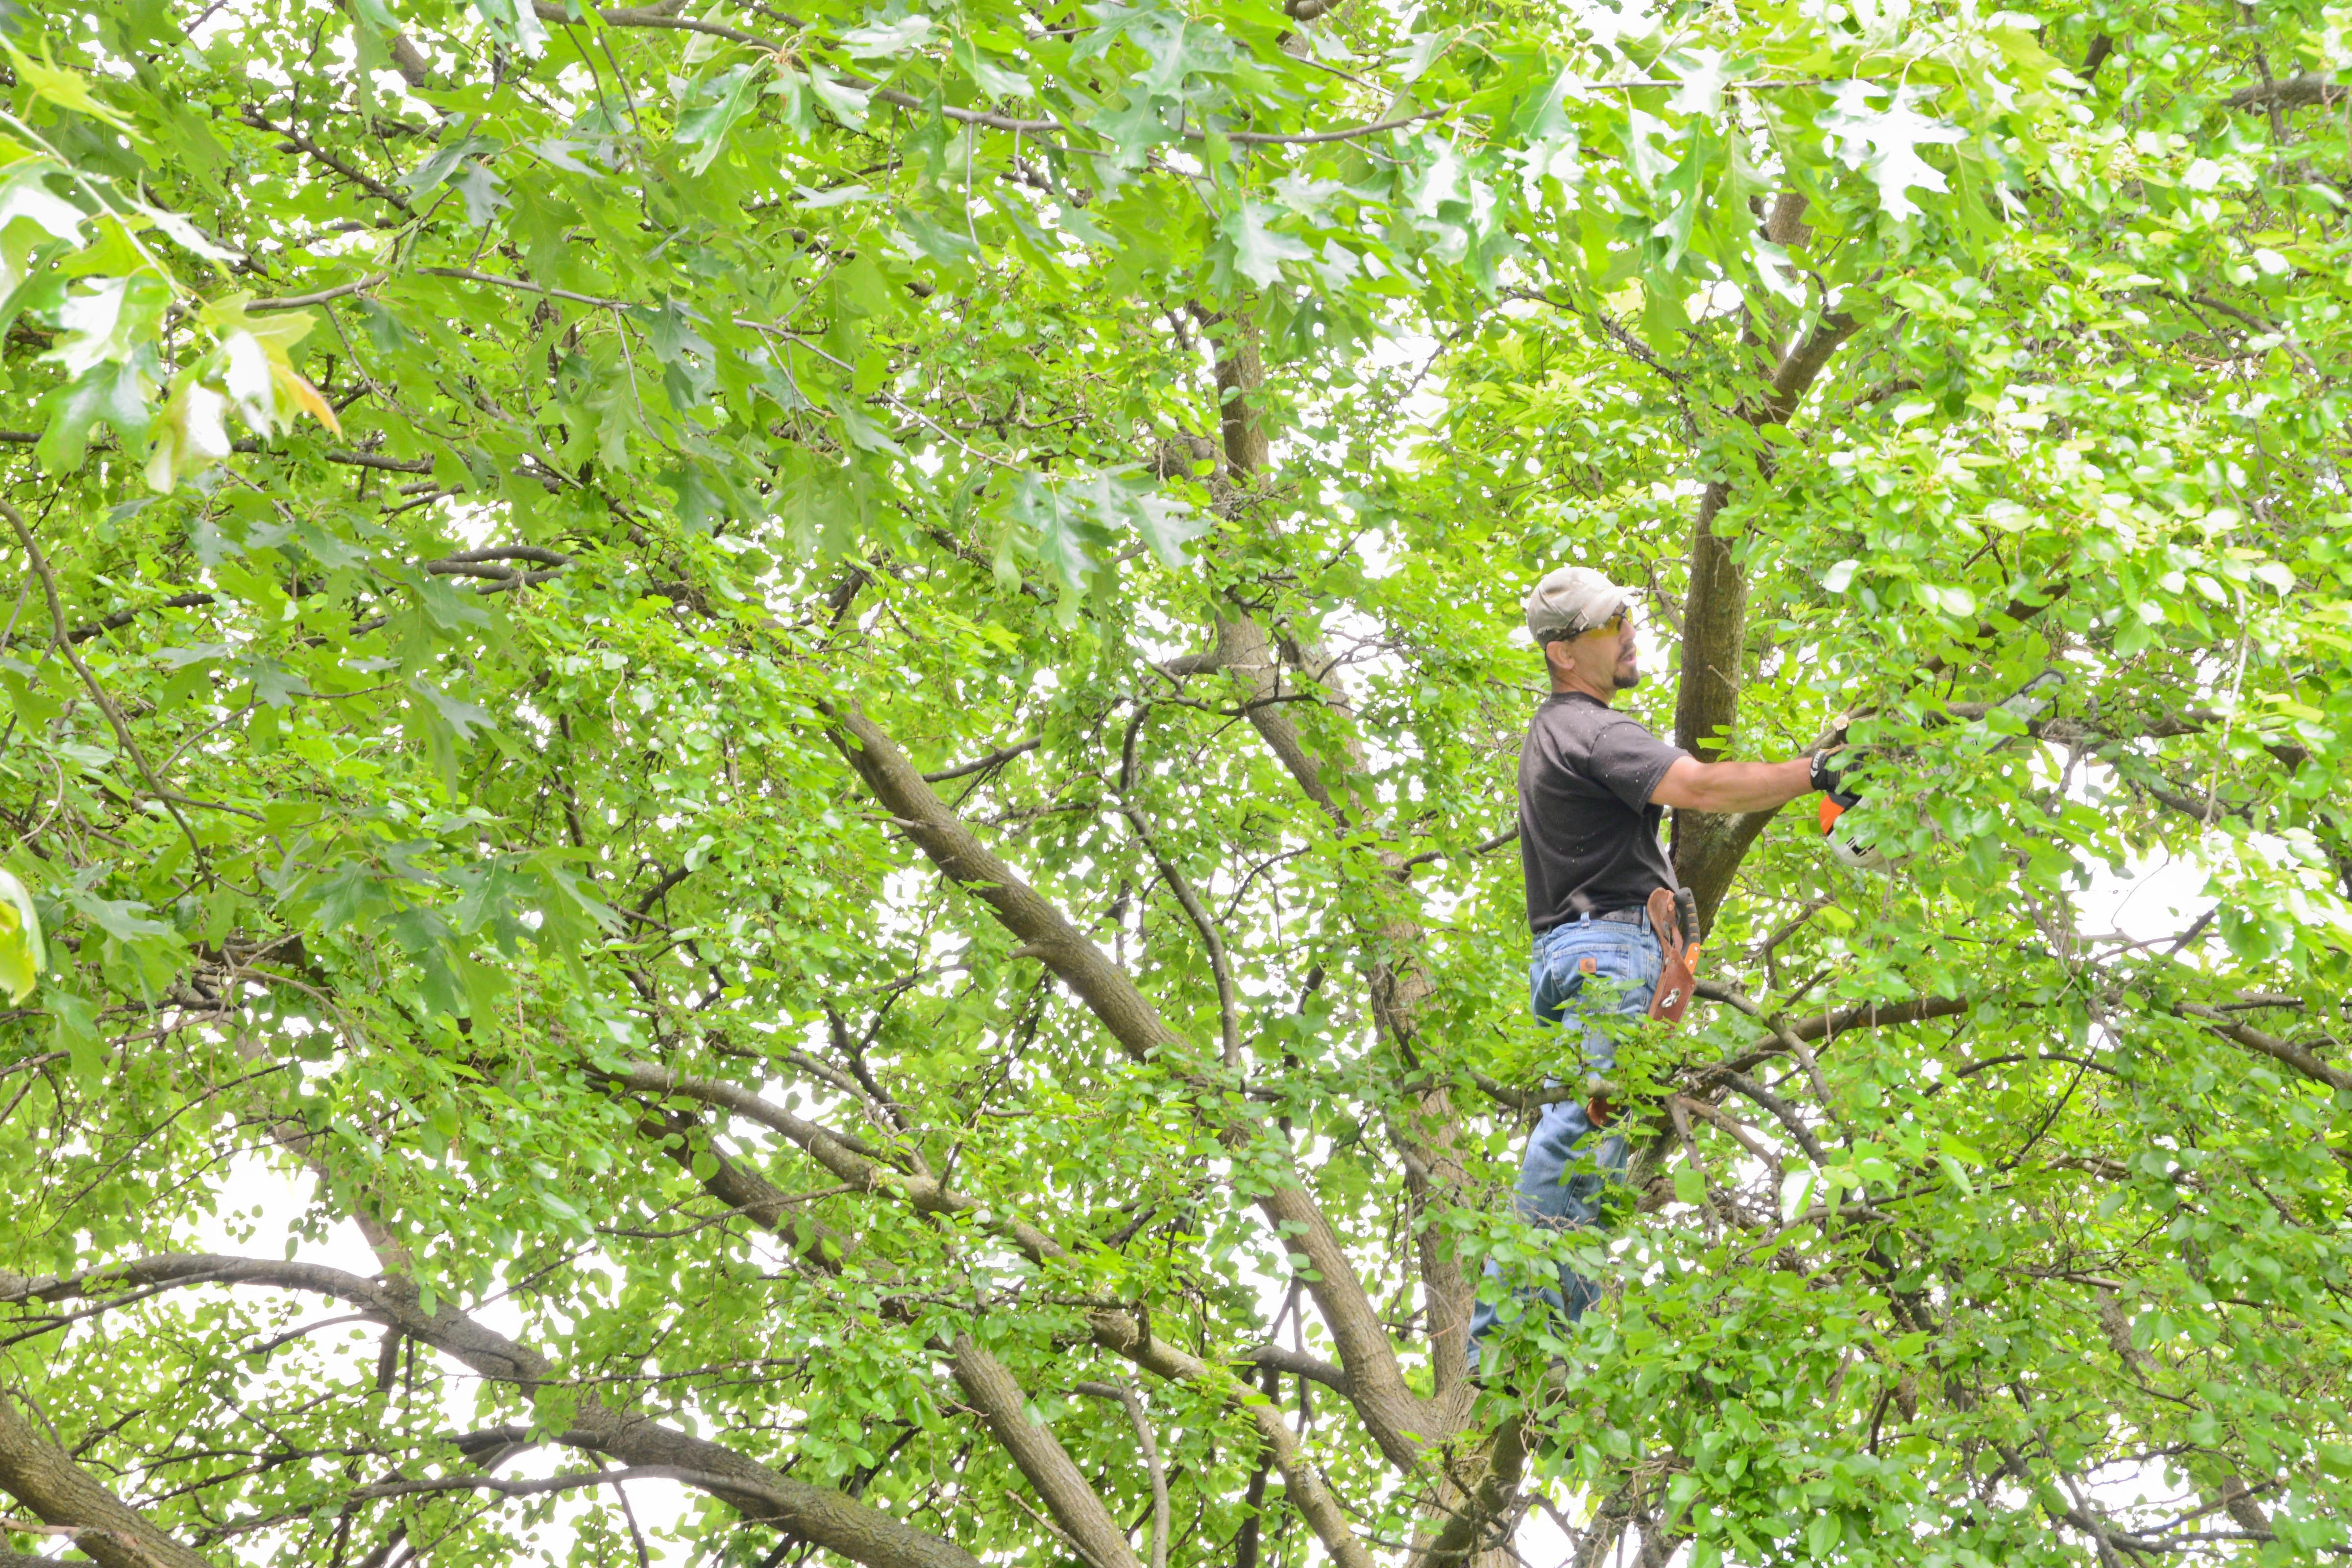 No Sweat Lawns & Trees, LLC image 4